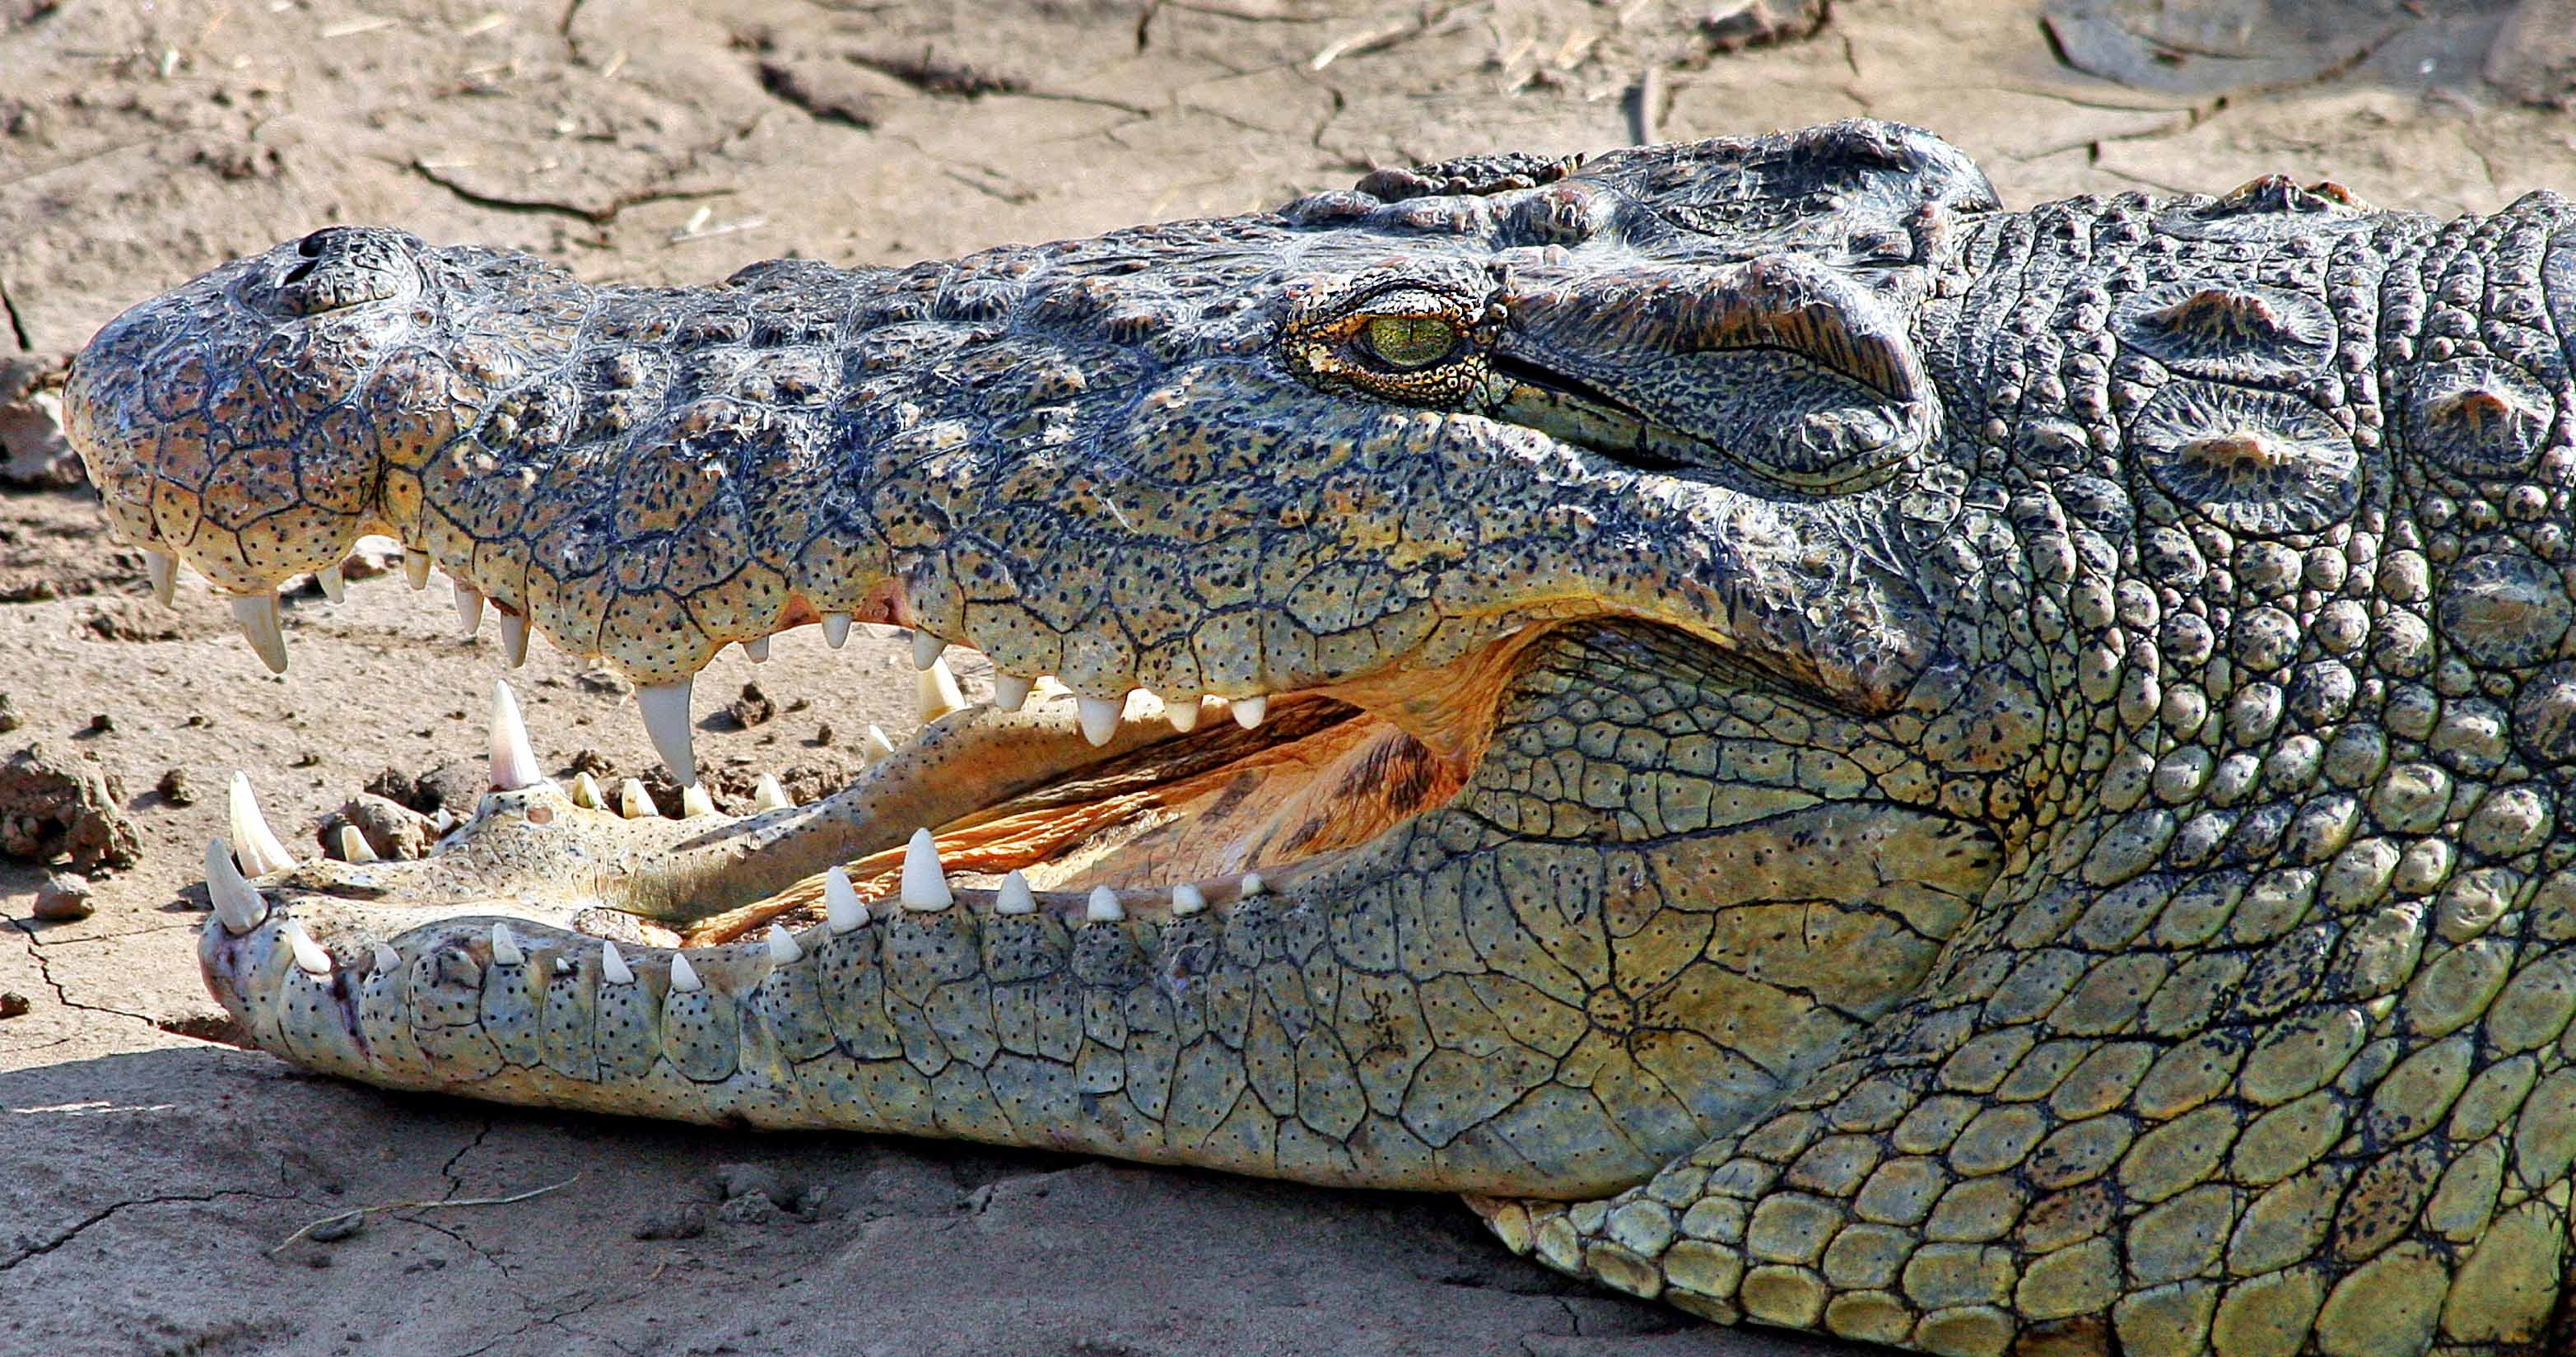 Nile Crocodile Most Deadly Animals